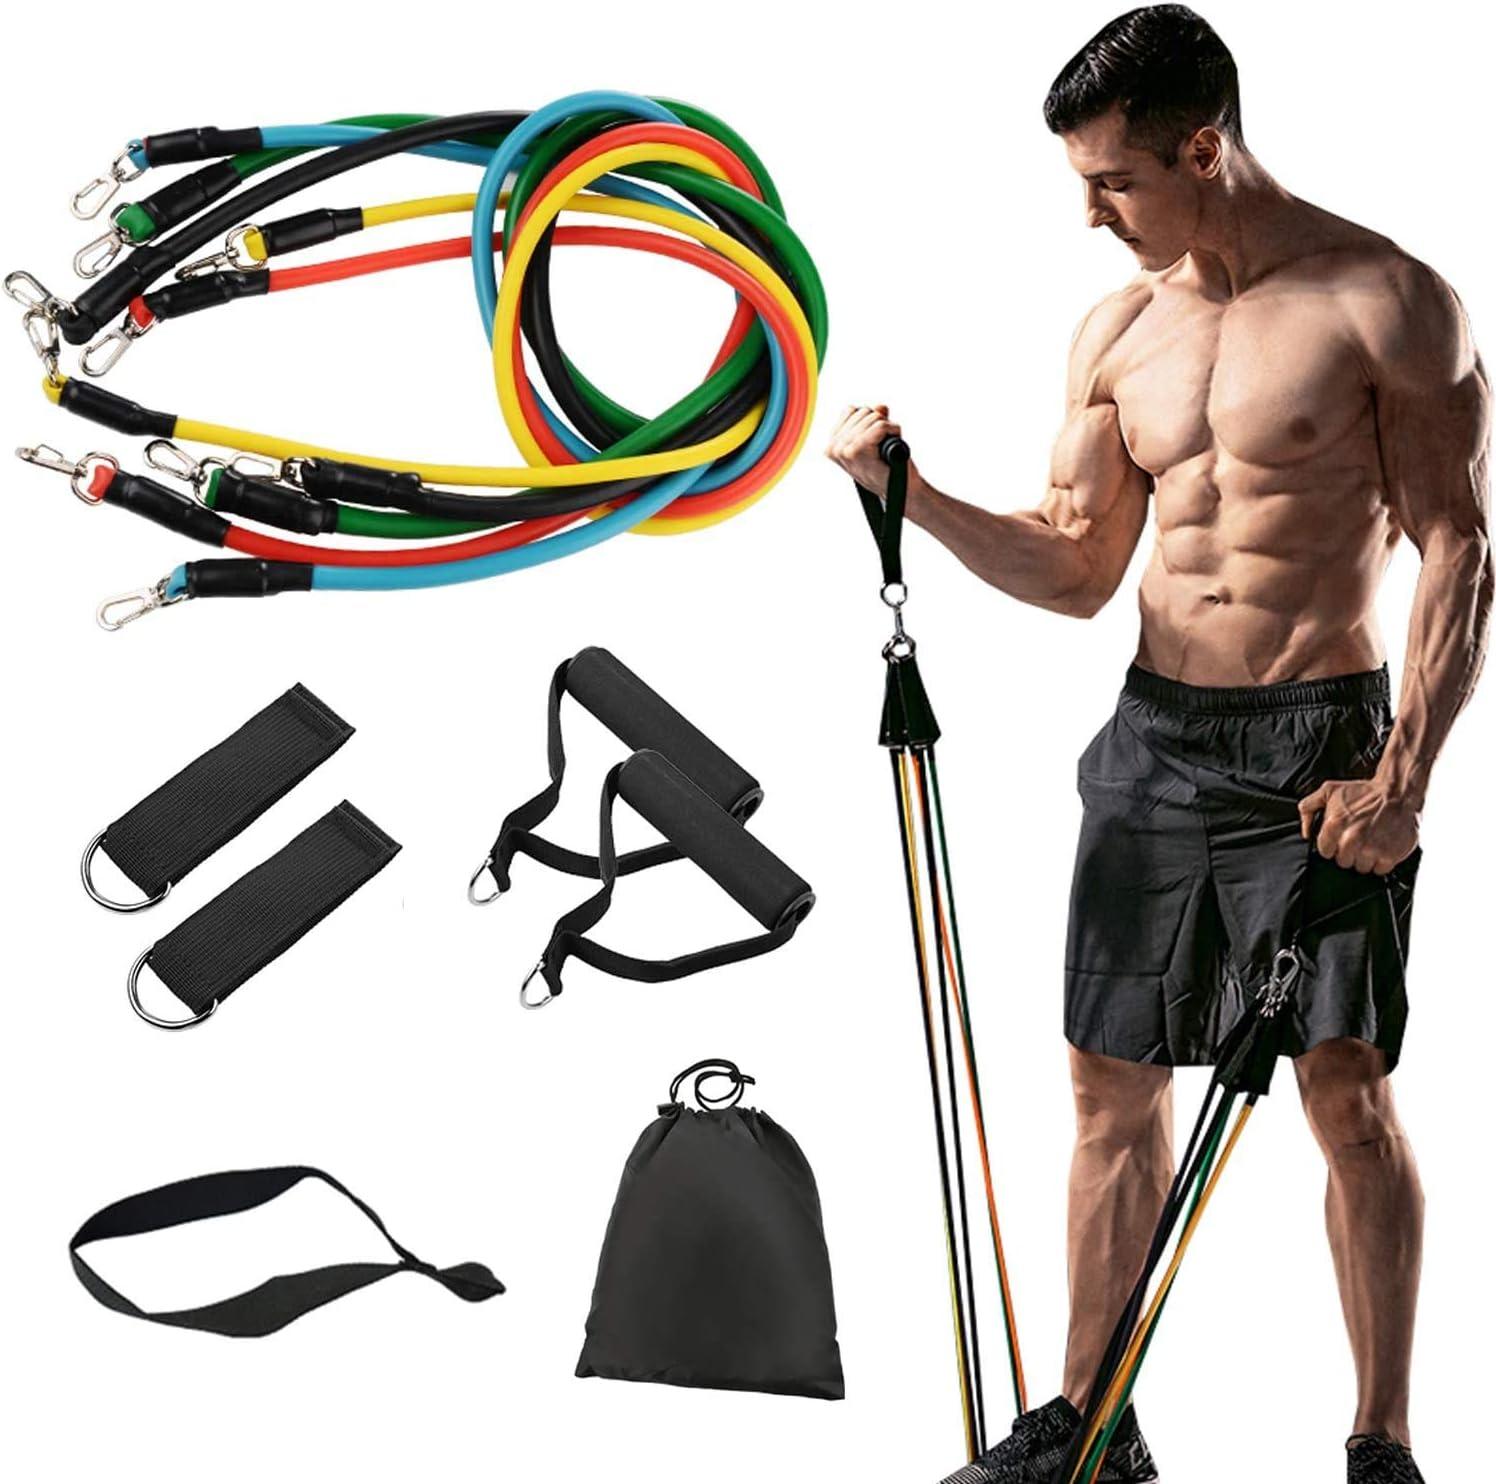 Resistance Band Set Yoga Pilates Workout Fitness Exercise Gym Straps PRO 1 2 3